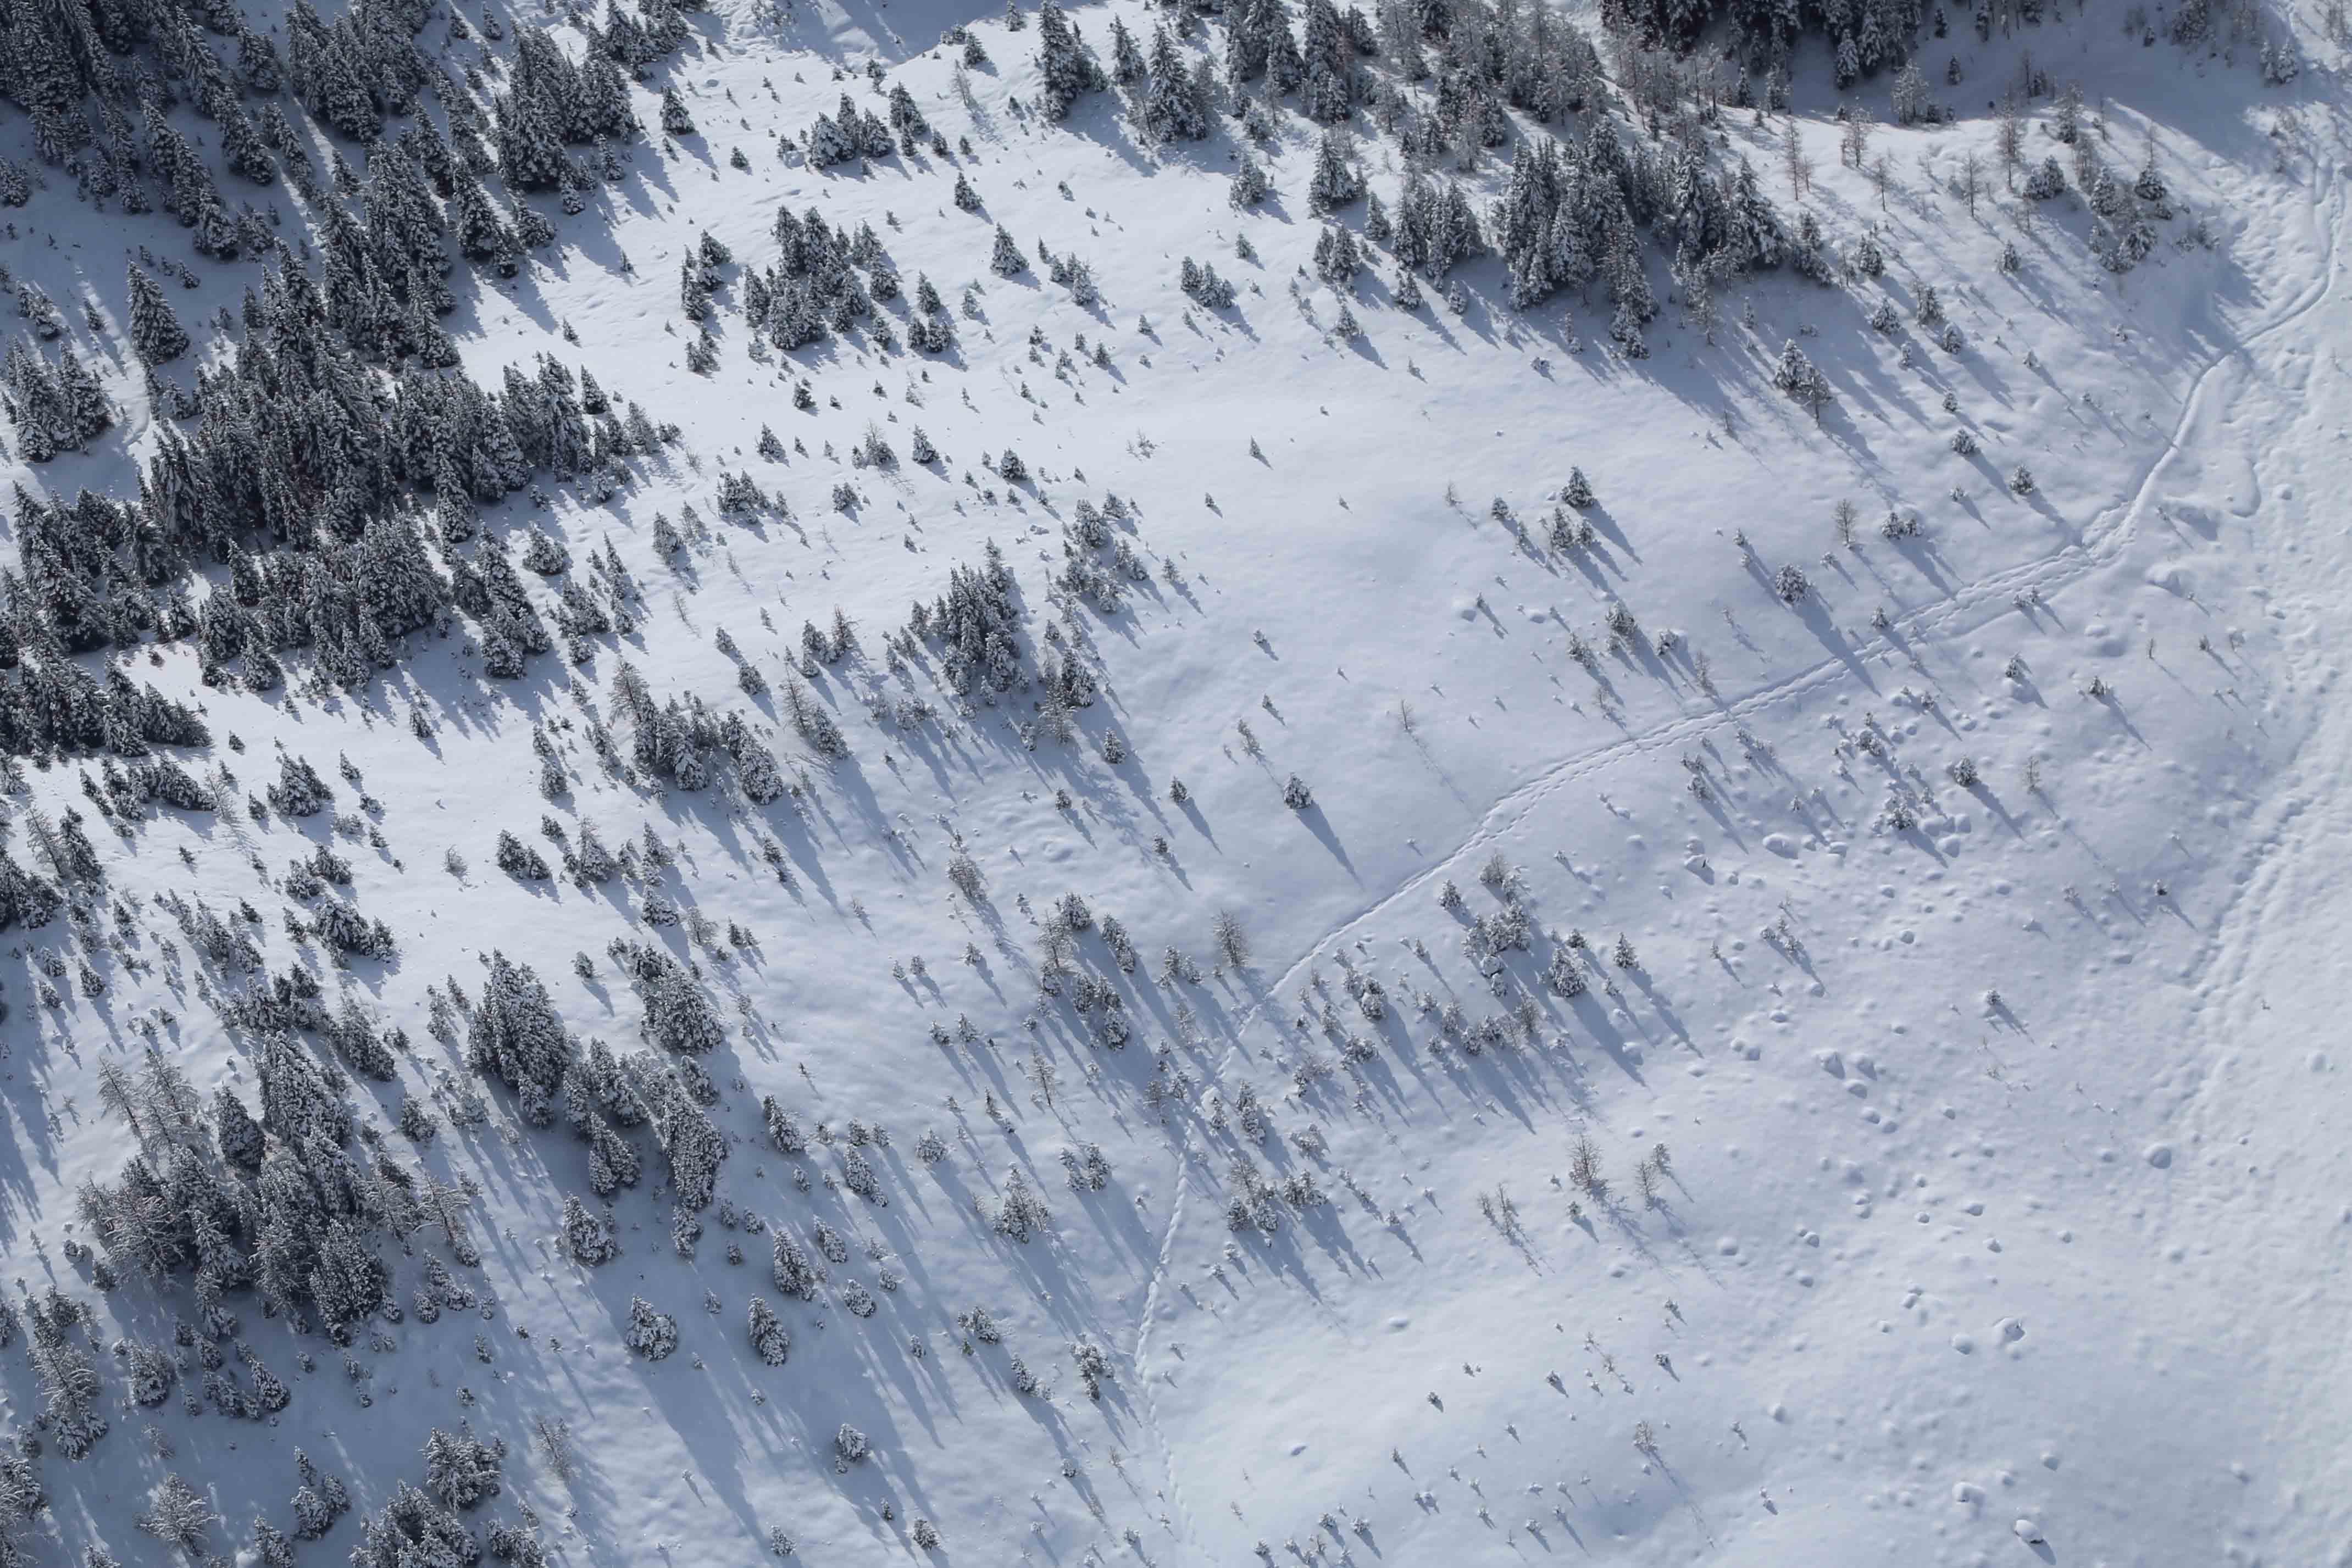 bird's eye view photography of snow